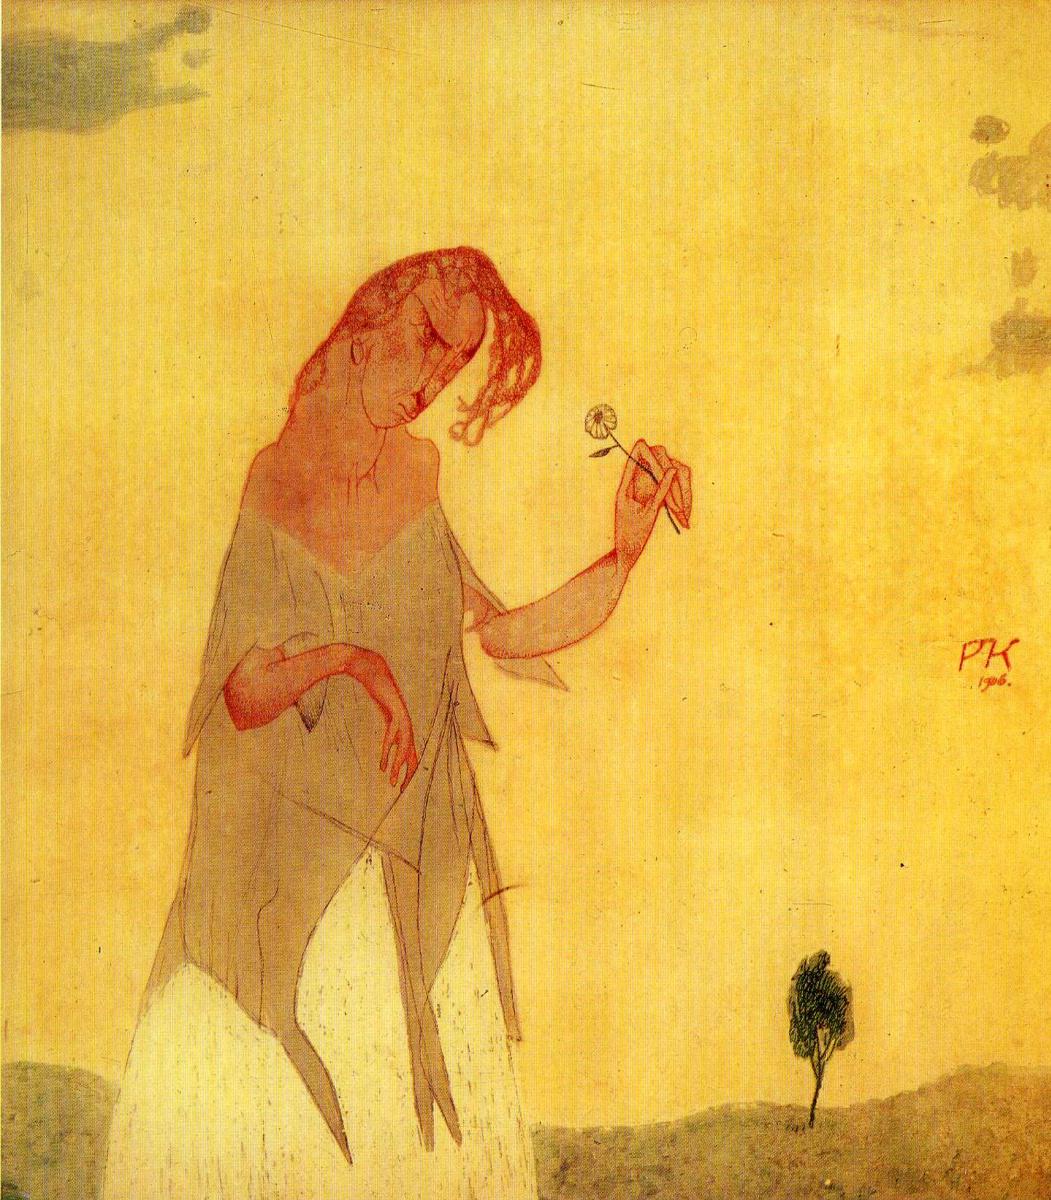 Paul Klee. Plot 21